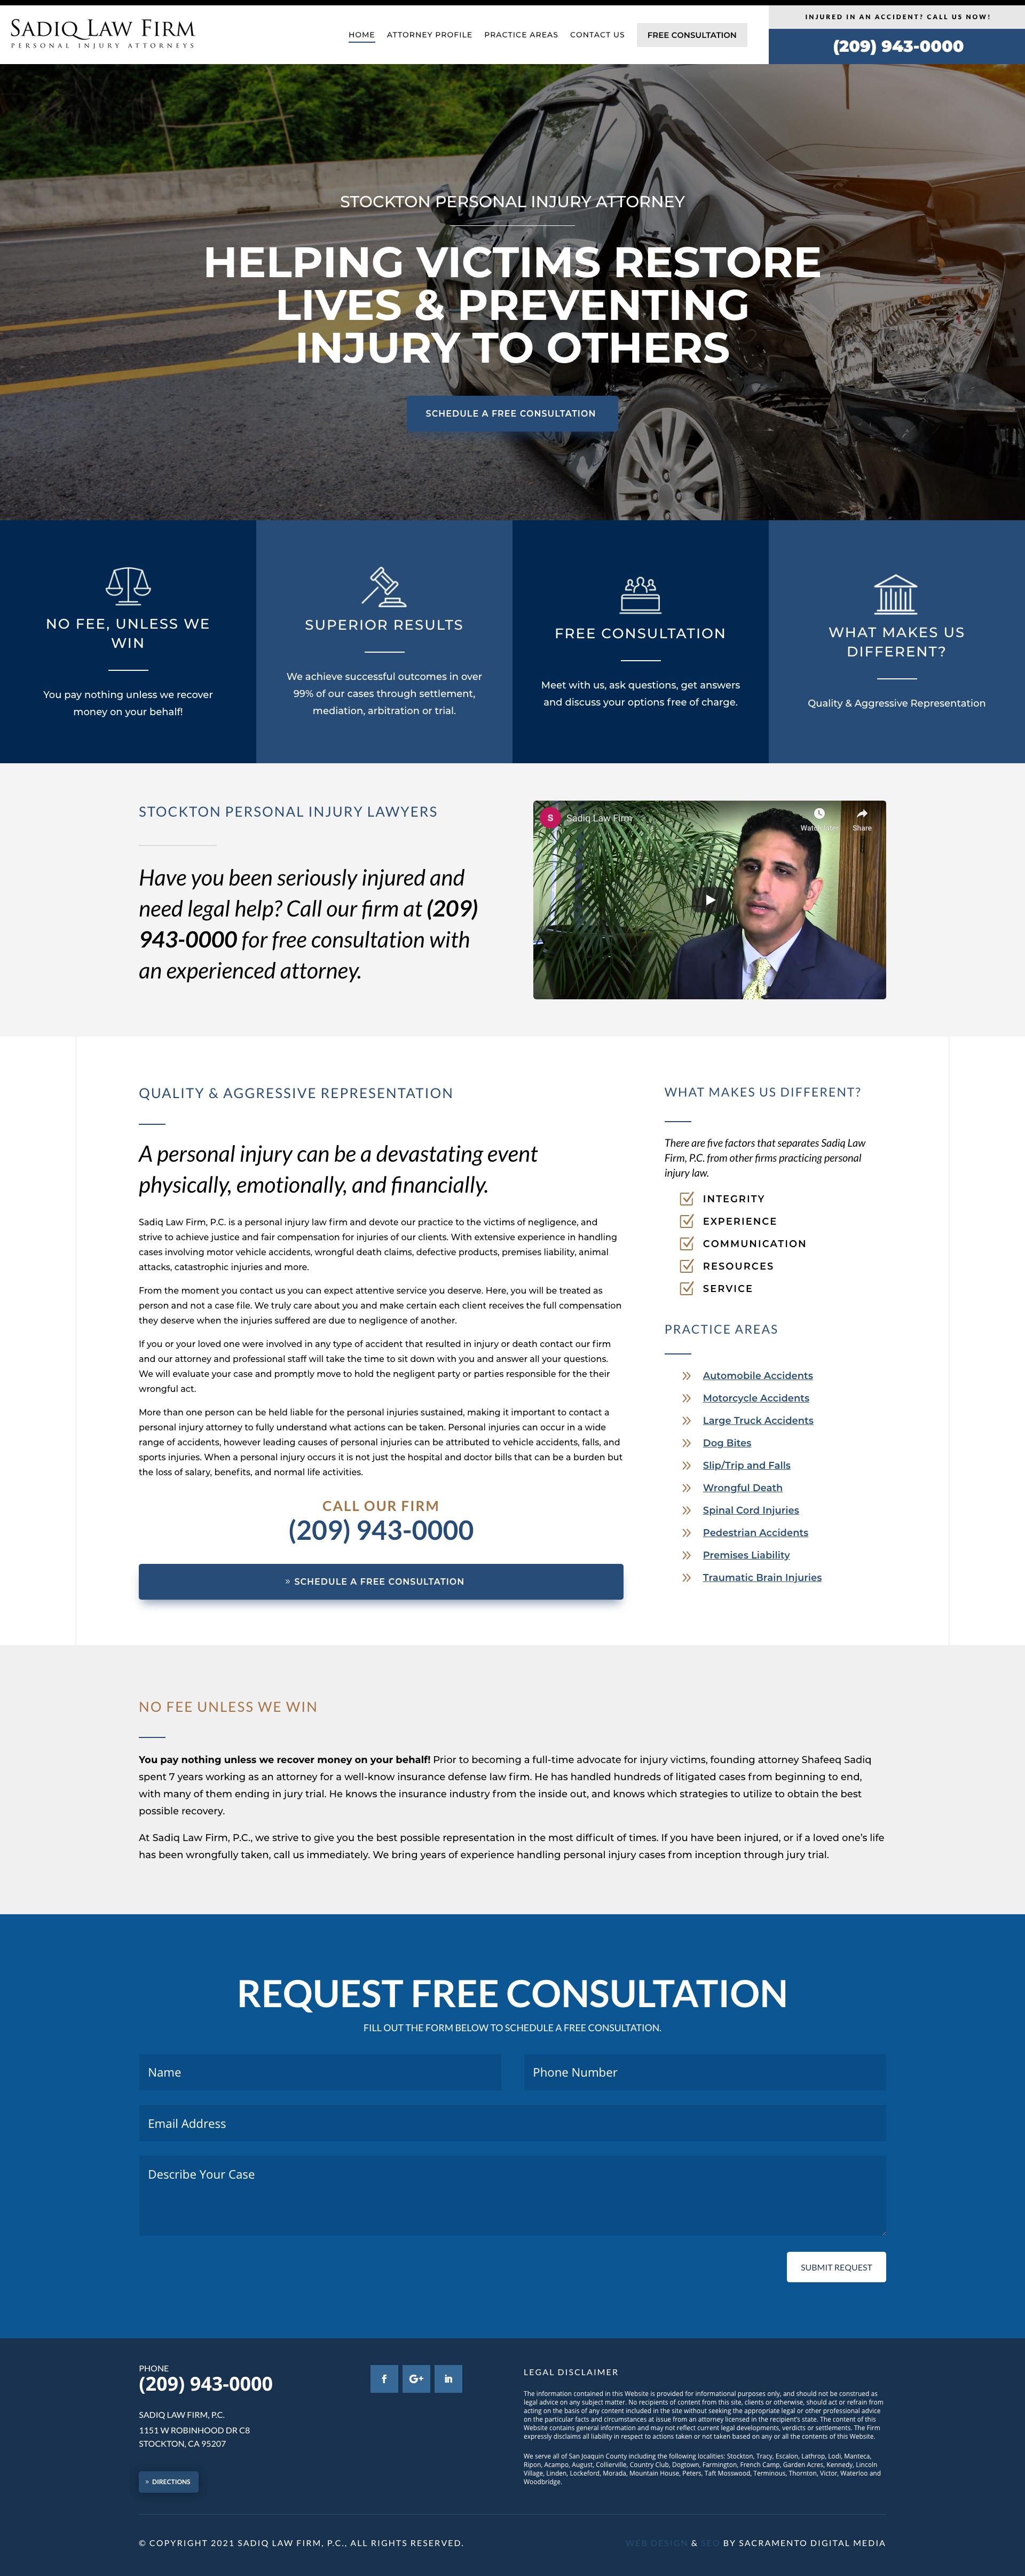 Sadiq Law Firm, P.C.